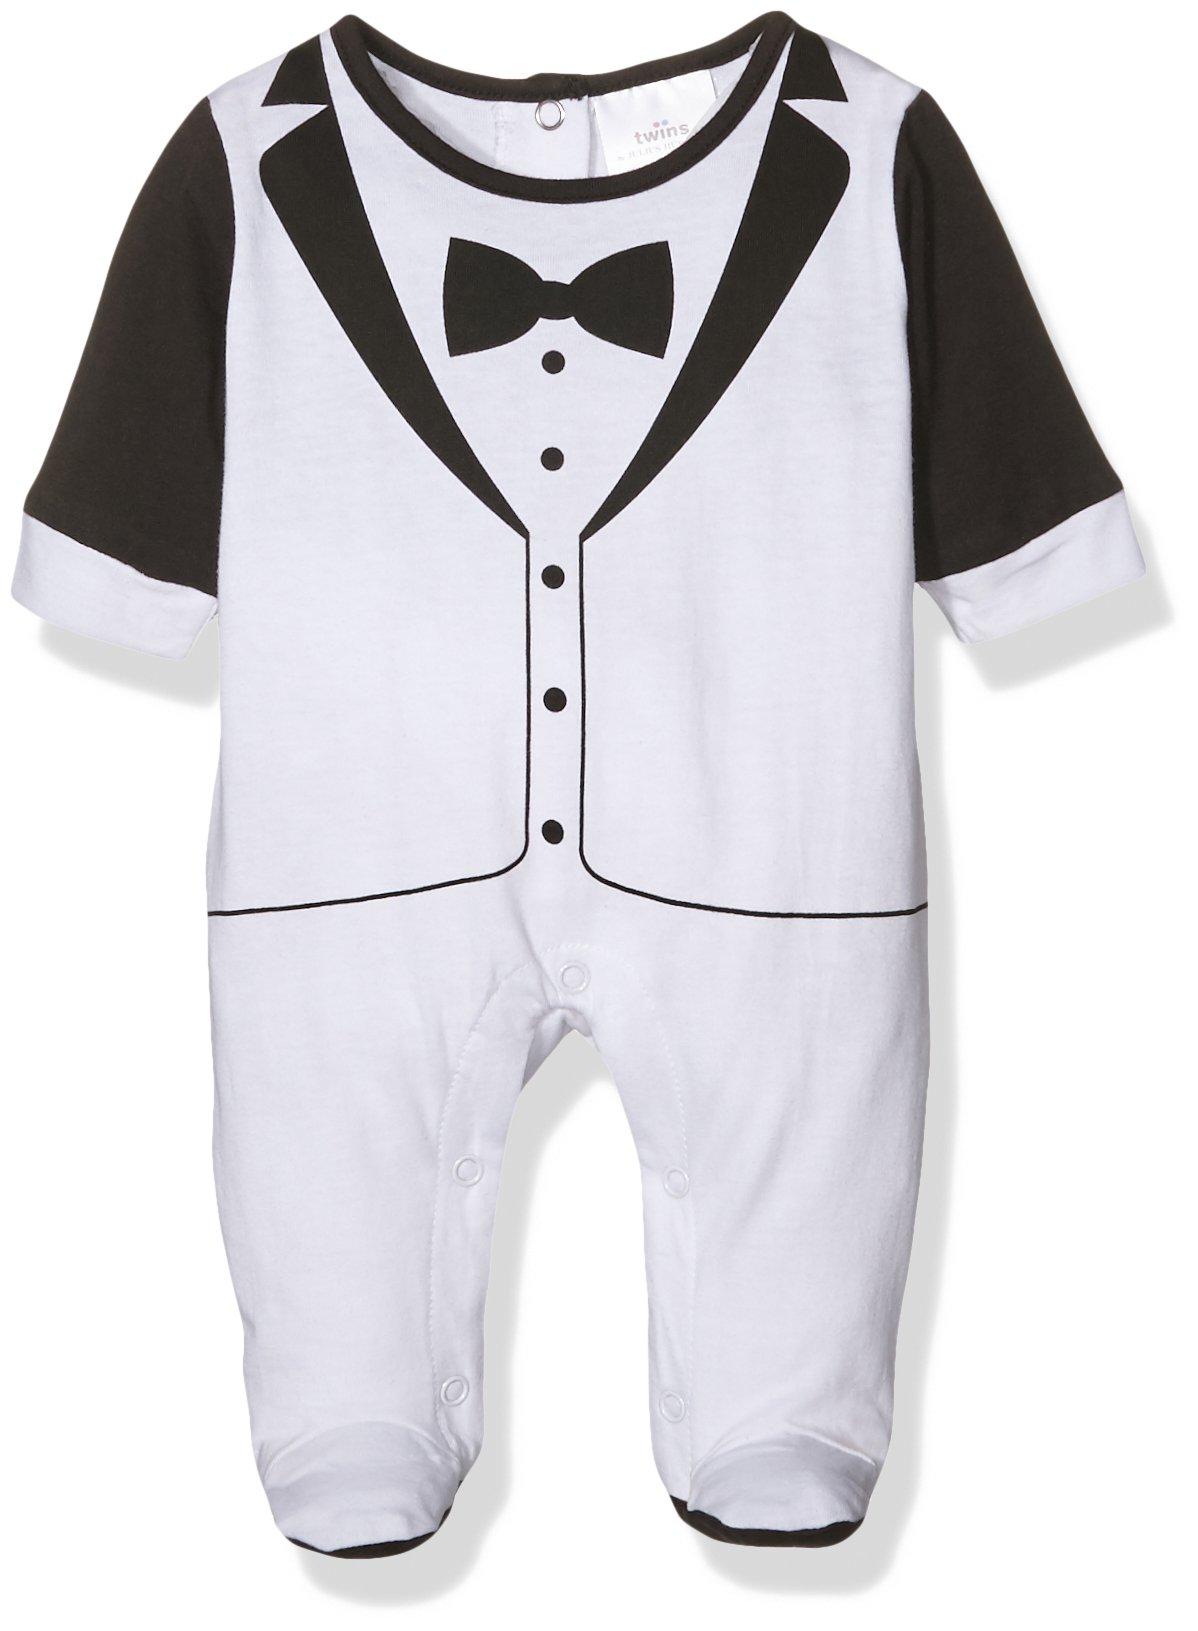 Twins Strampler White Dream - Pijama Bebé-Niños 1